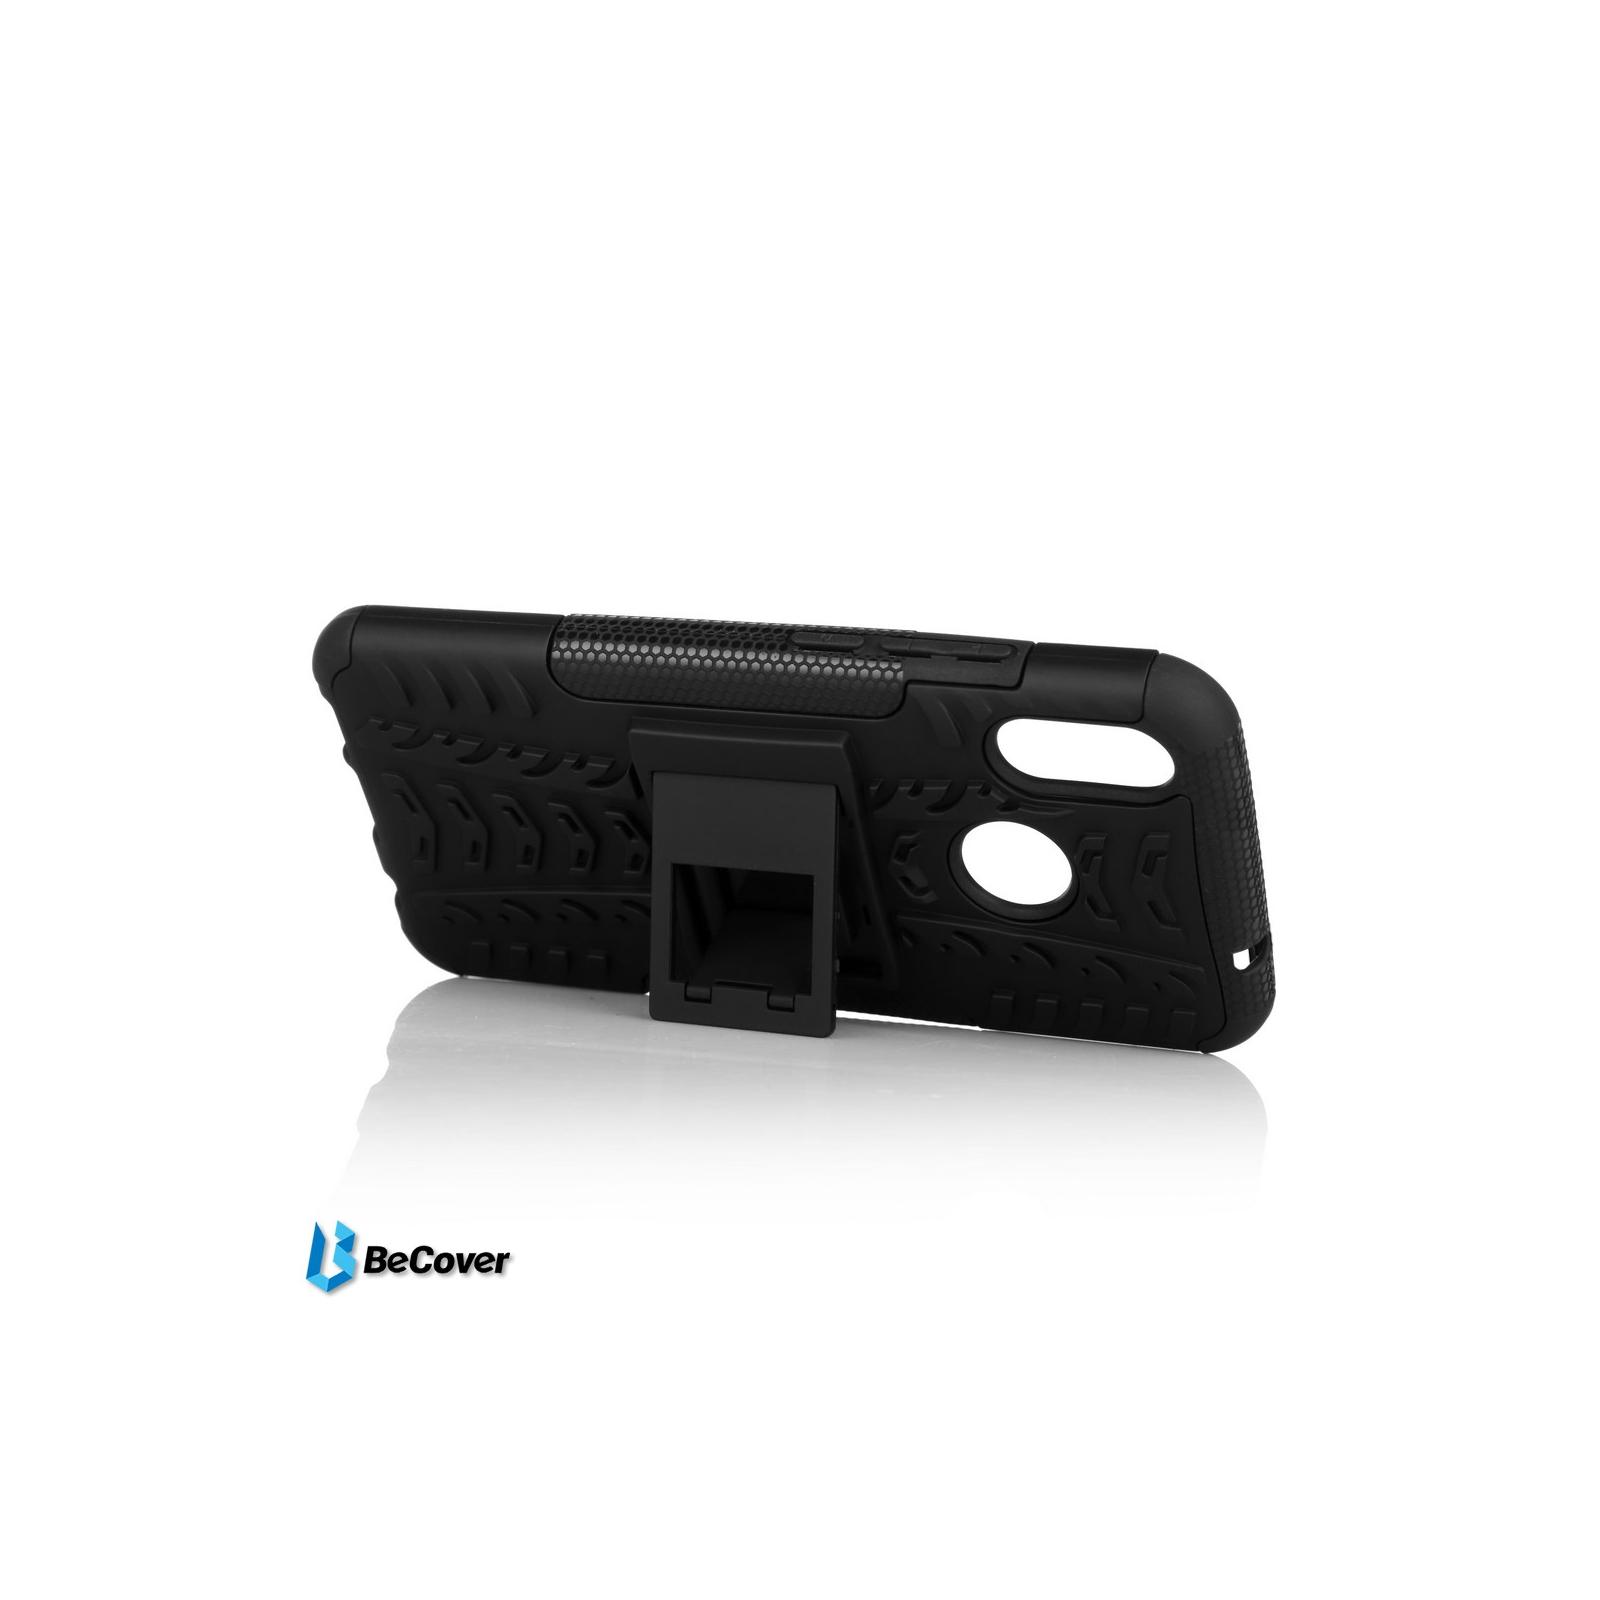 Чехол для моб. телефона BeCover Huawei P Smart+ Black (702769) изображение 2